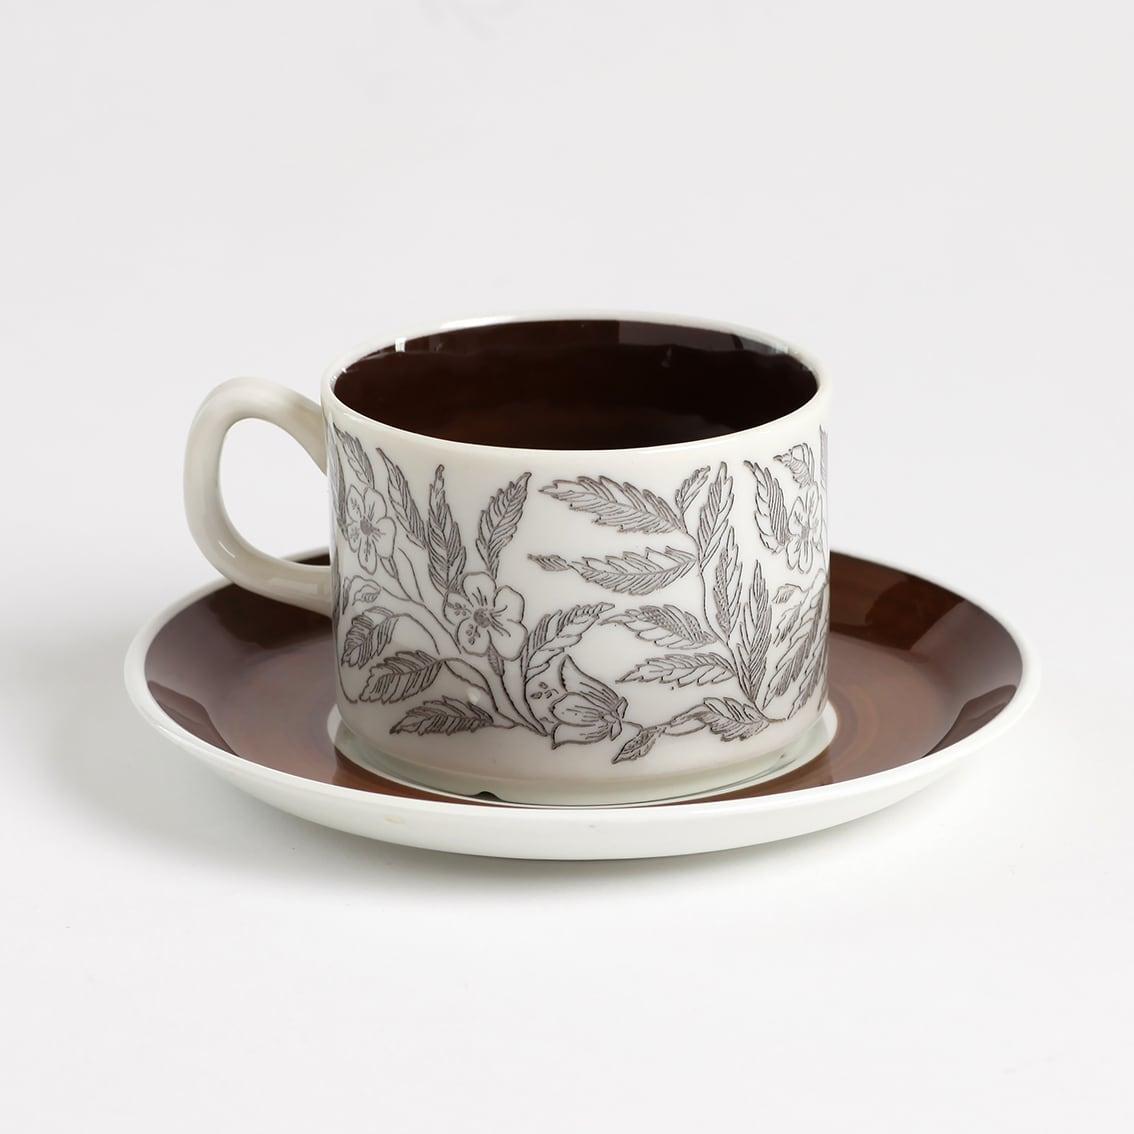 GEFLE ゲフレ Fontana フォンタナ コーヒーカップ&ソーサー - 6 北欧ヴィンテージ